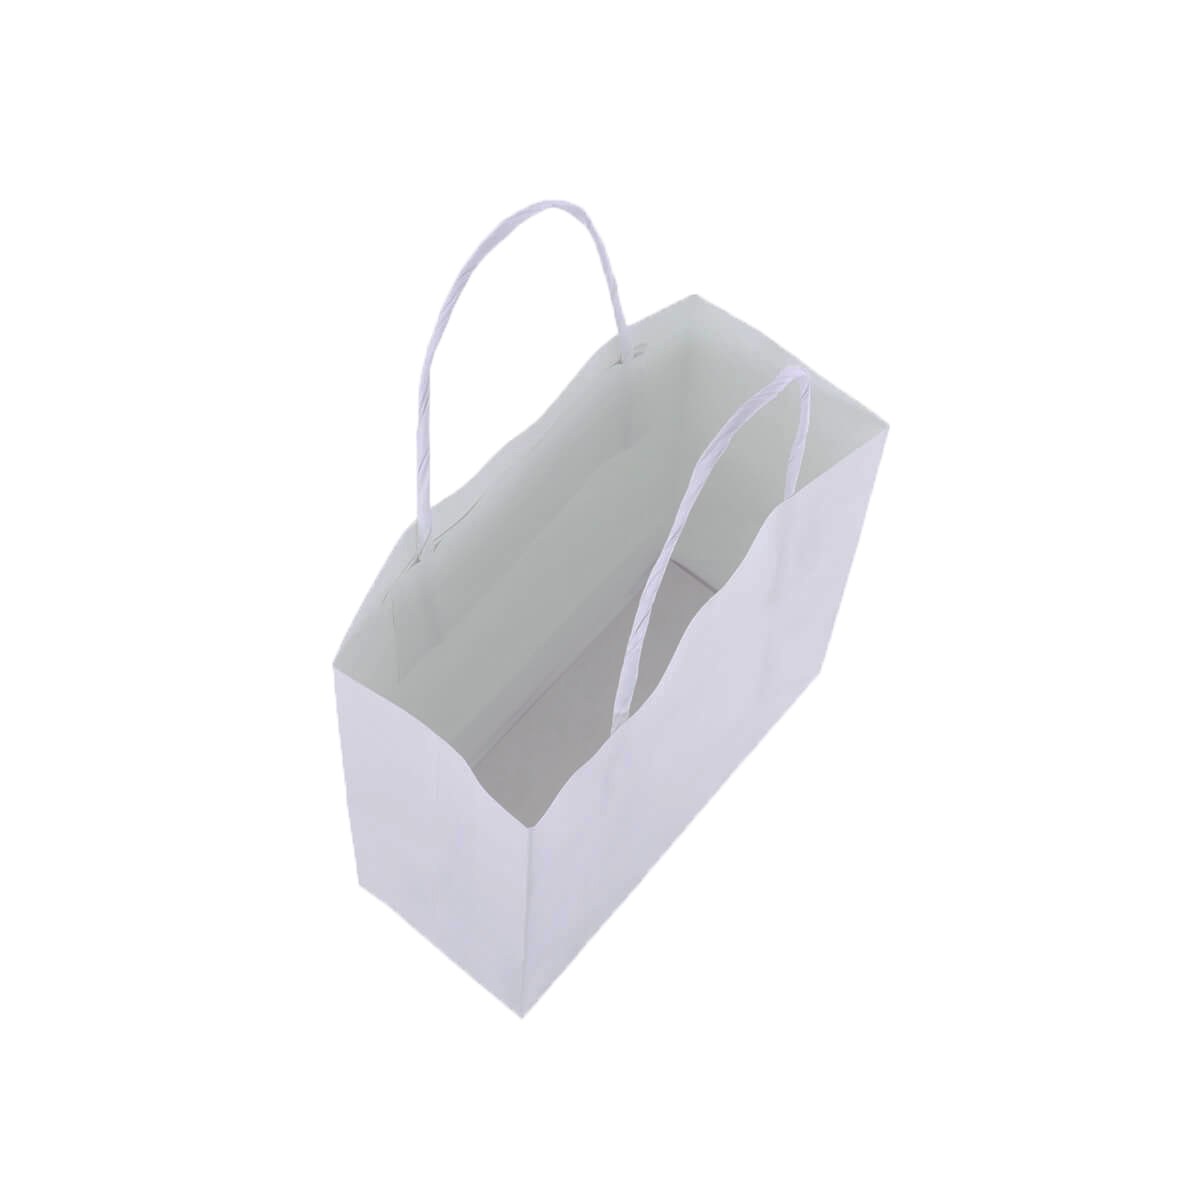 Kit 300 Sacolas Branca Pequena 17x16x7